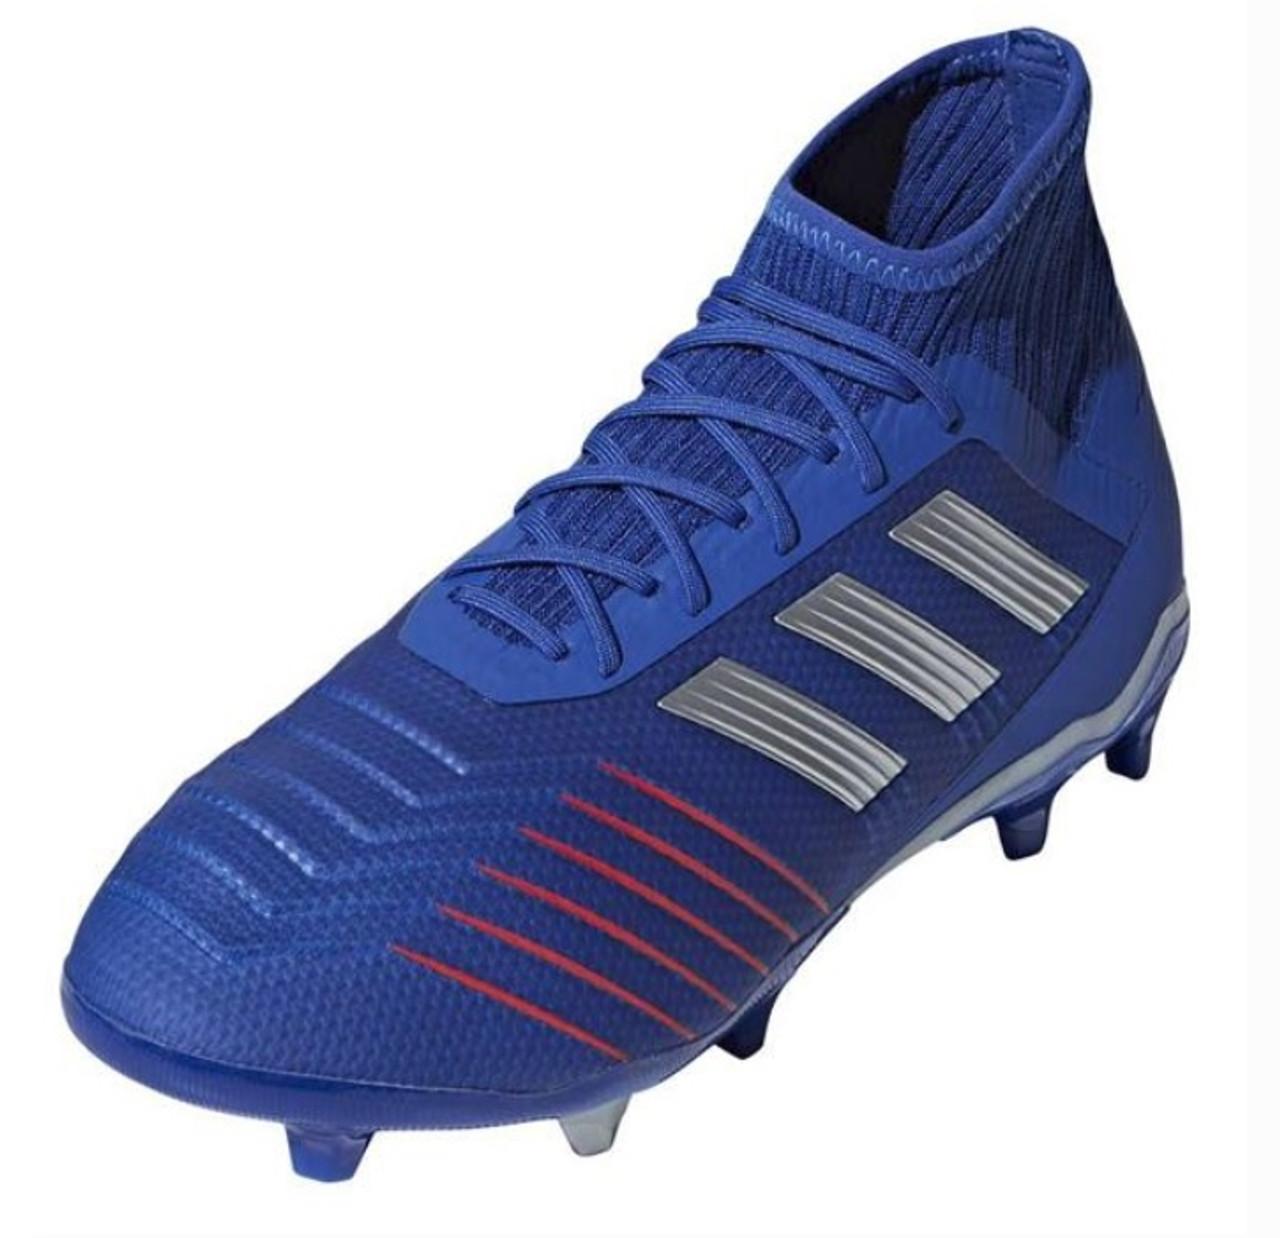 Adidas Predator 19.1 FG Jr. - Bold Blue